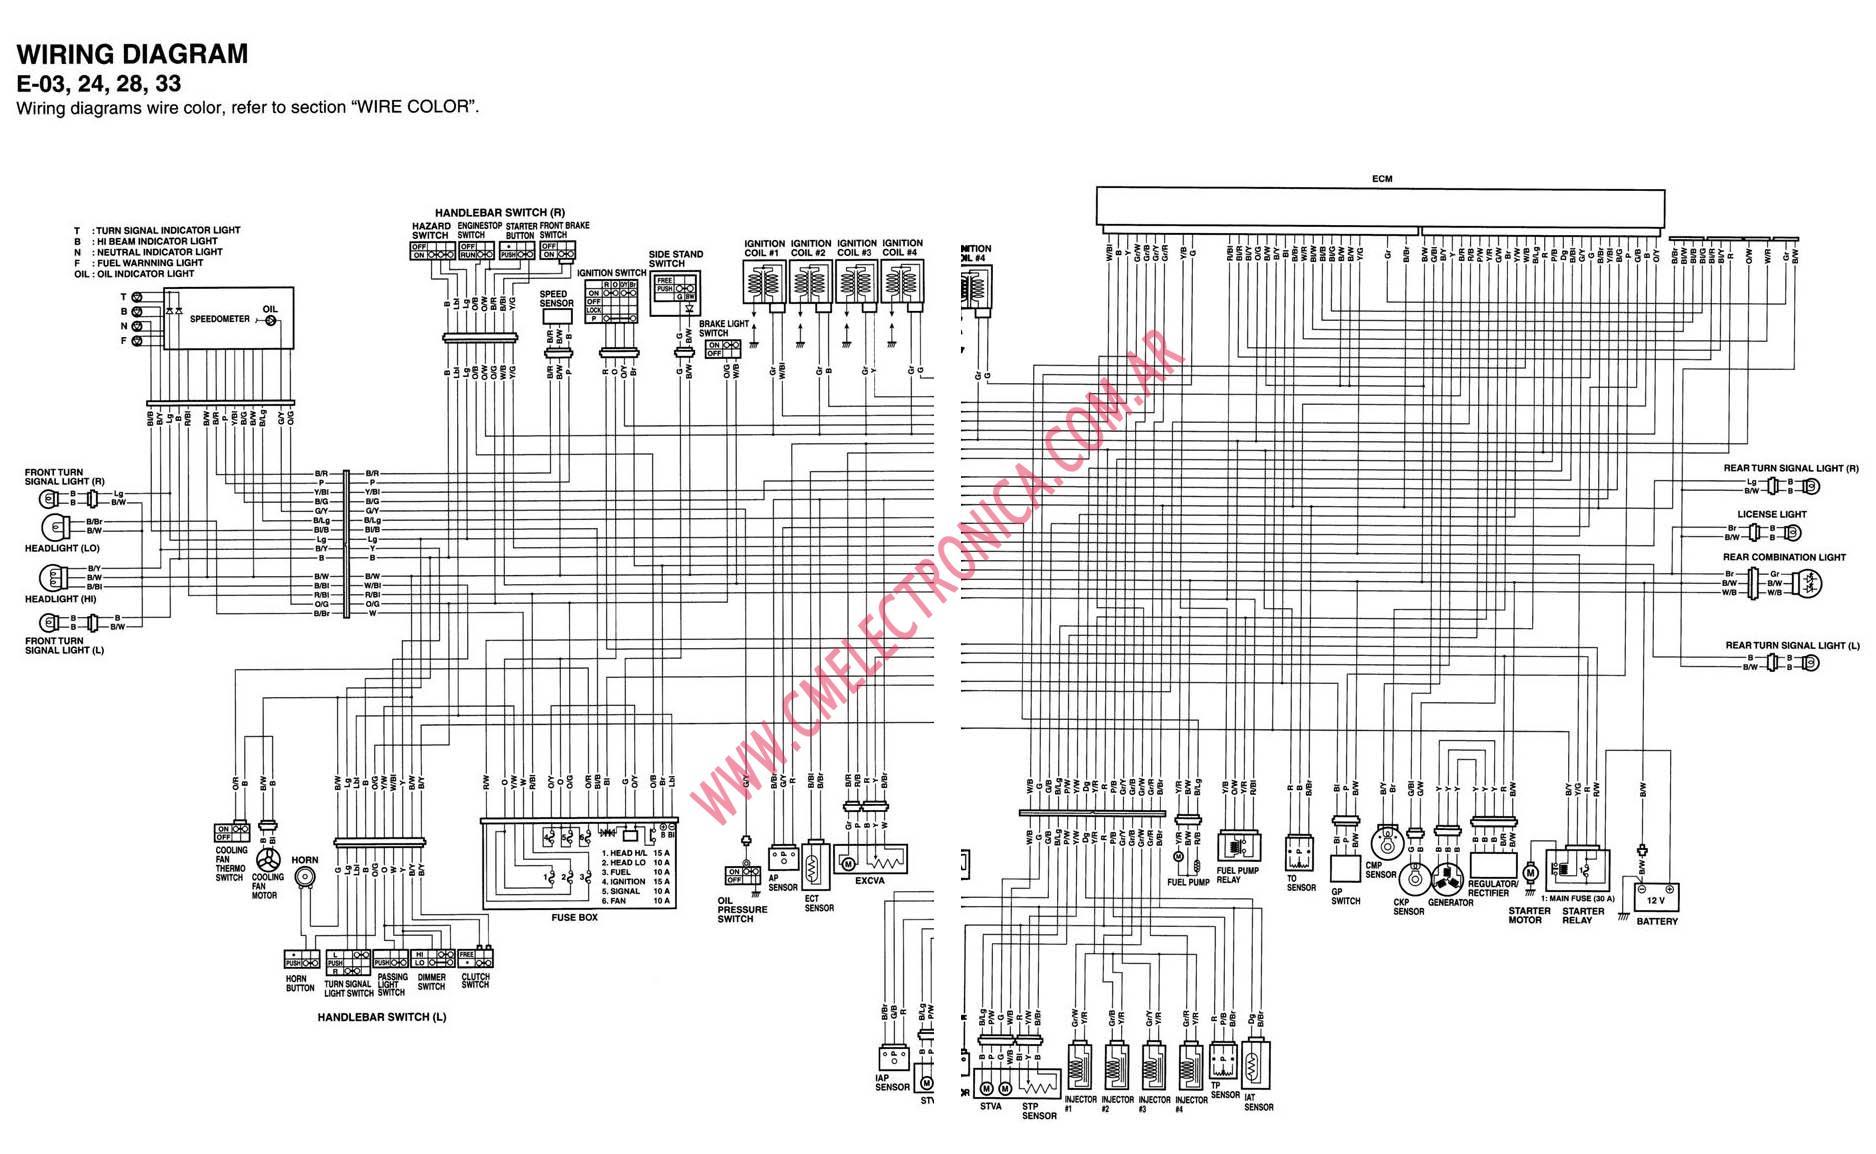 05 Gsxr 1000 Wiring Diagram Simple Suzuki Transmission Diagrams 2005 600 02